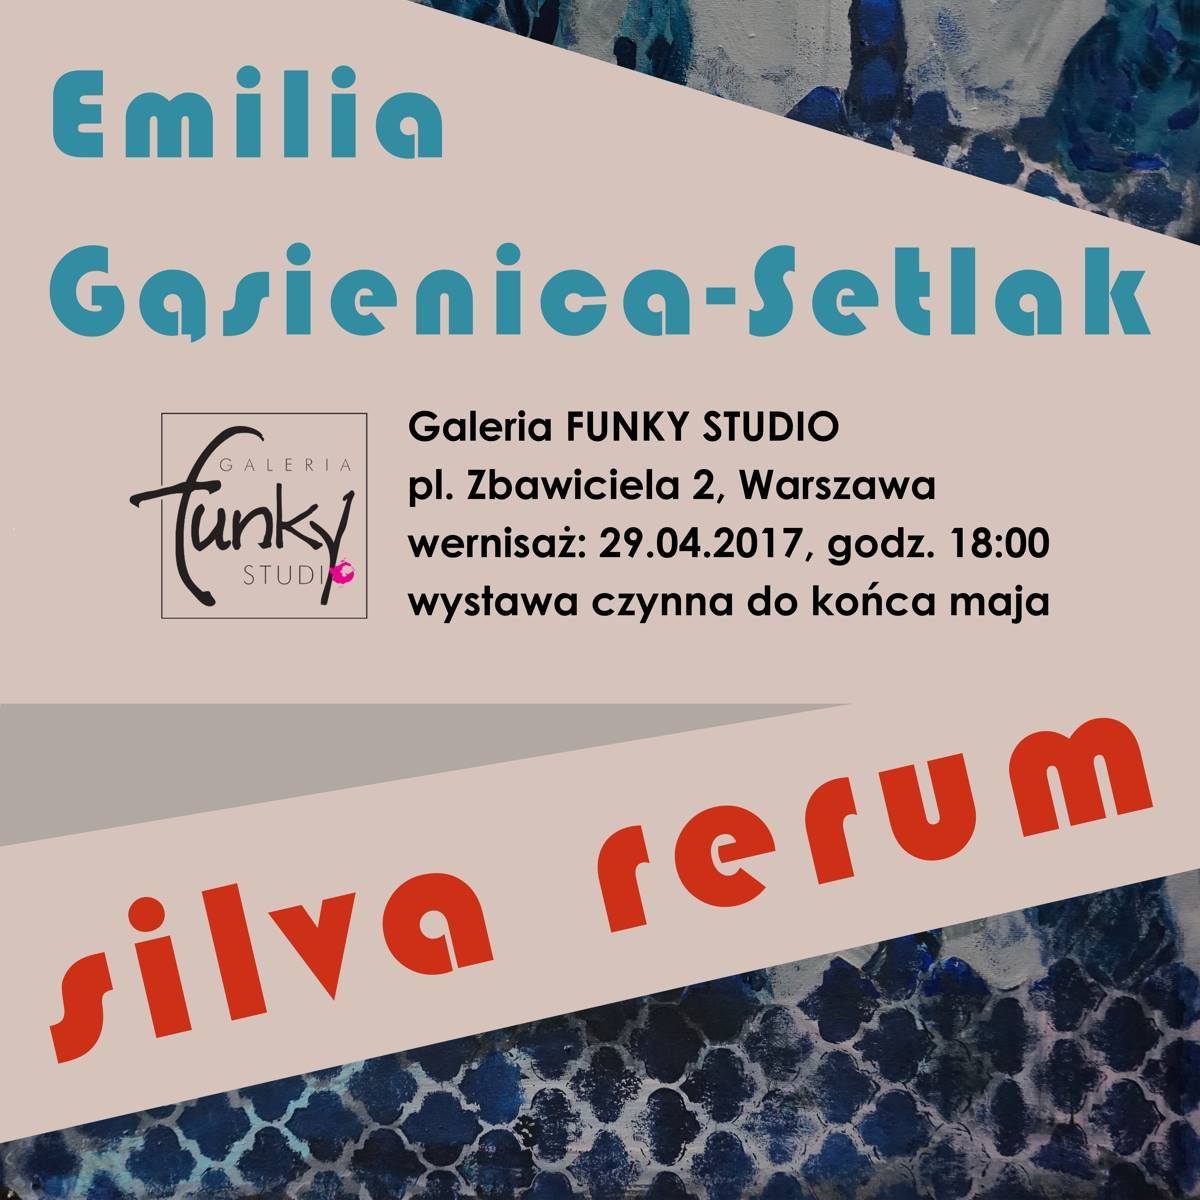 Silva rerum - wystawa prac autorstwa Emilii Gąsienicy-Setlak